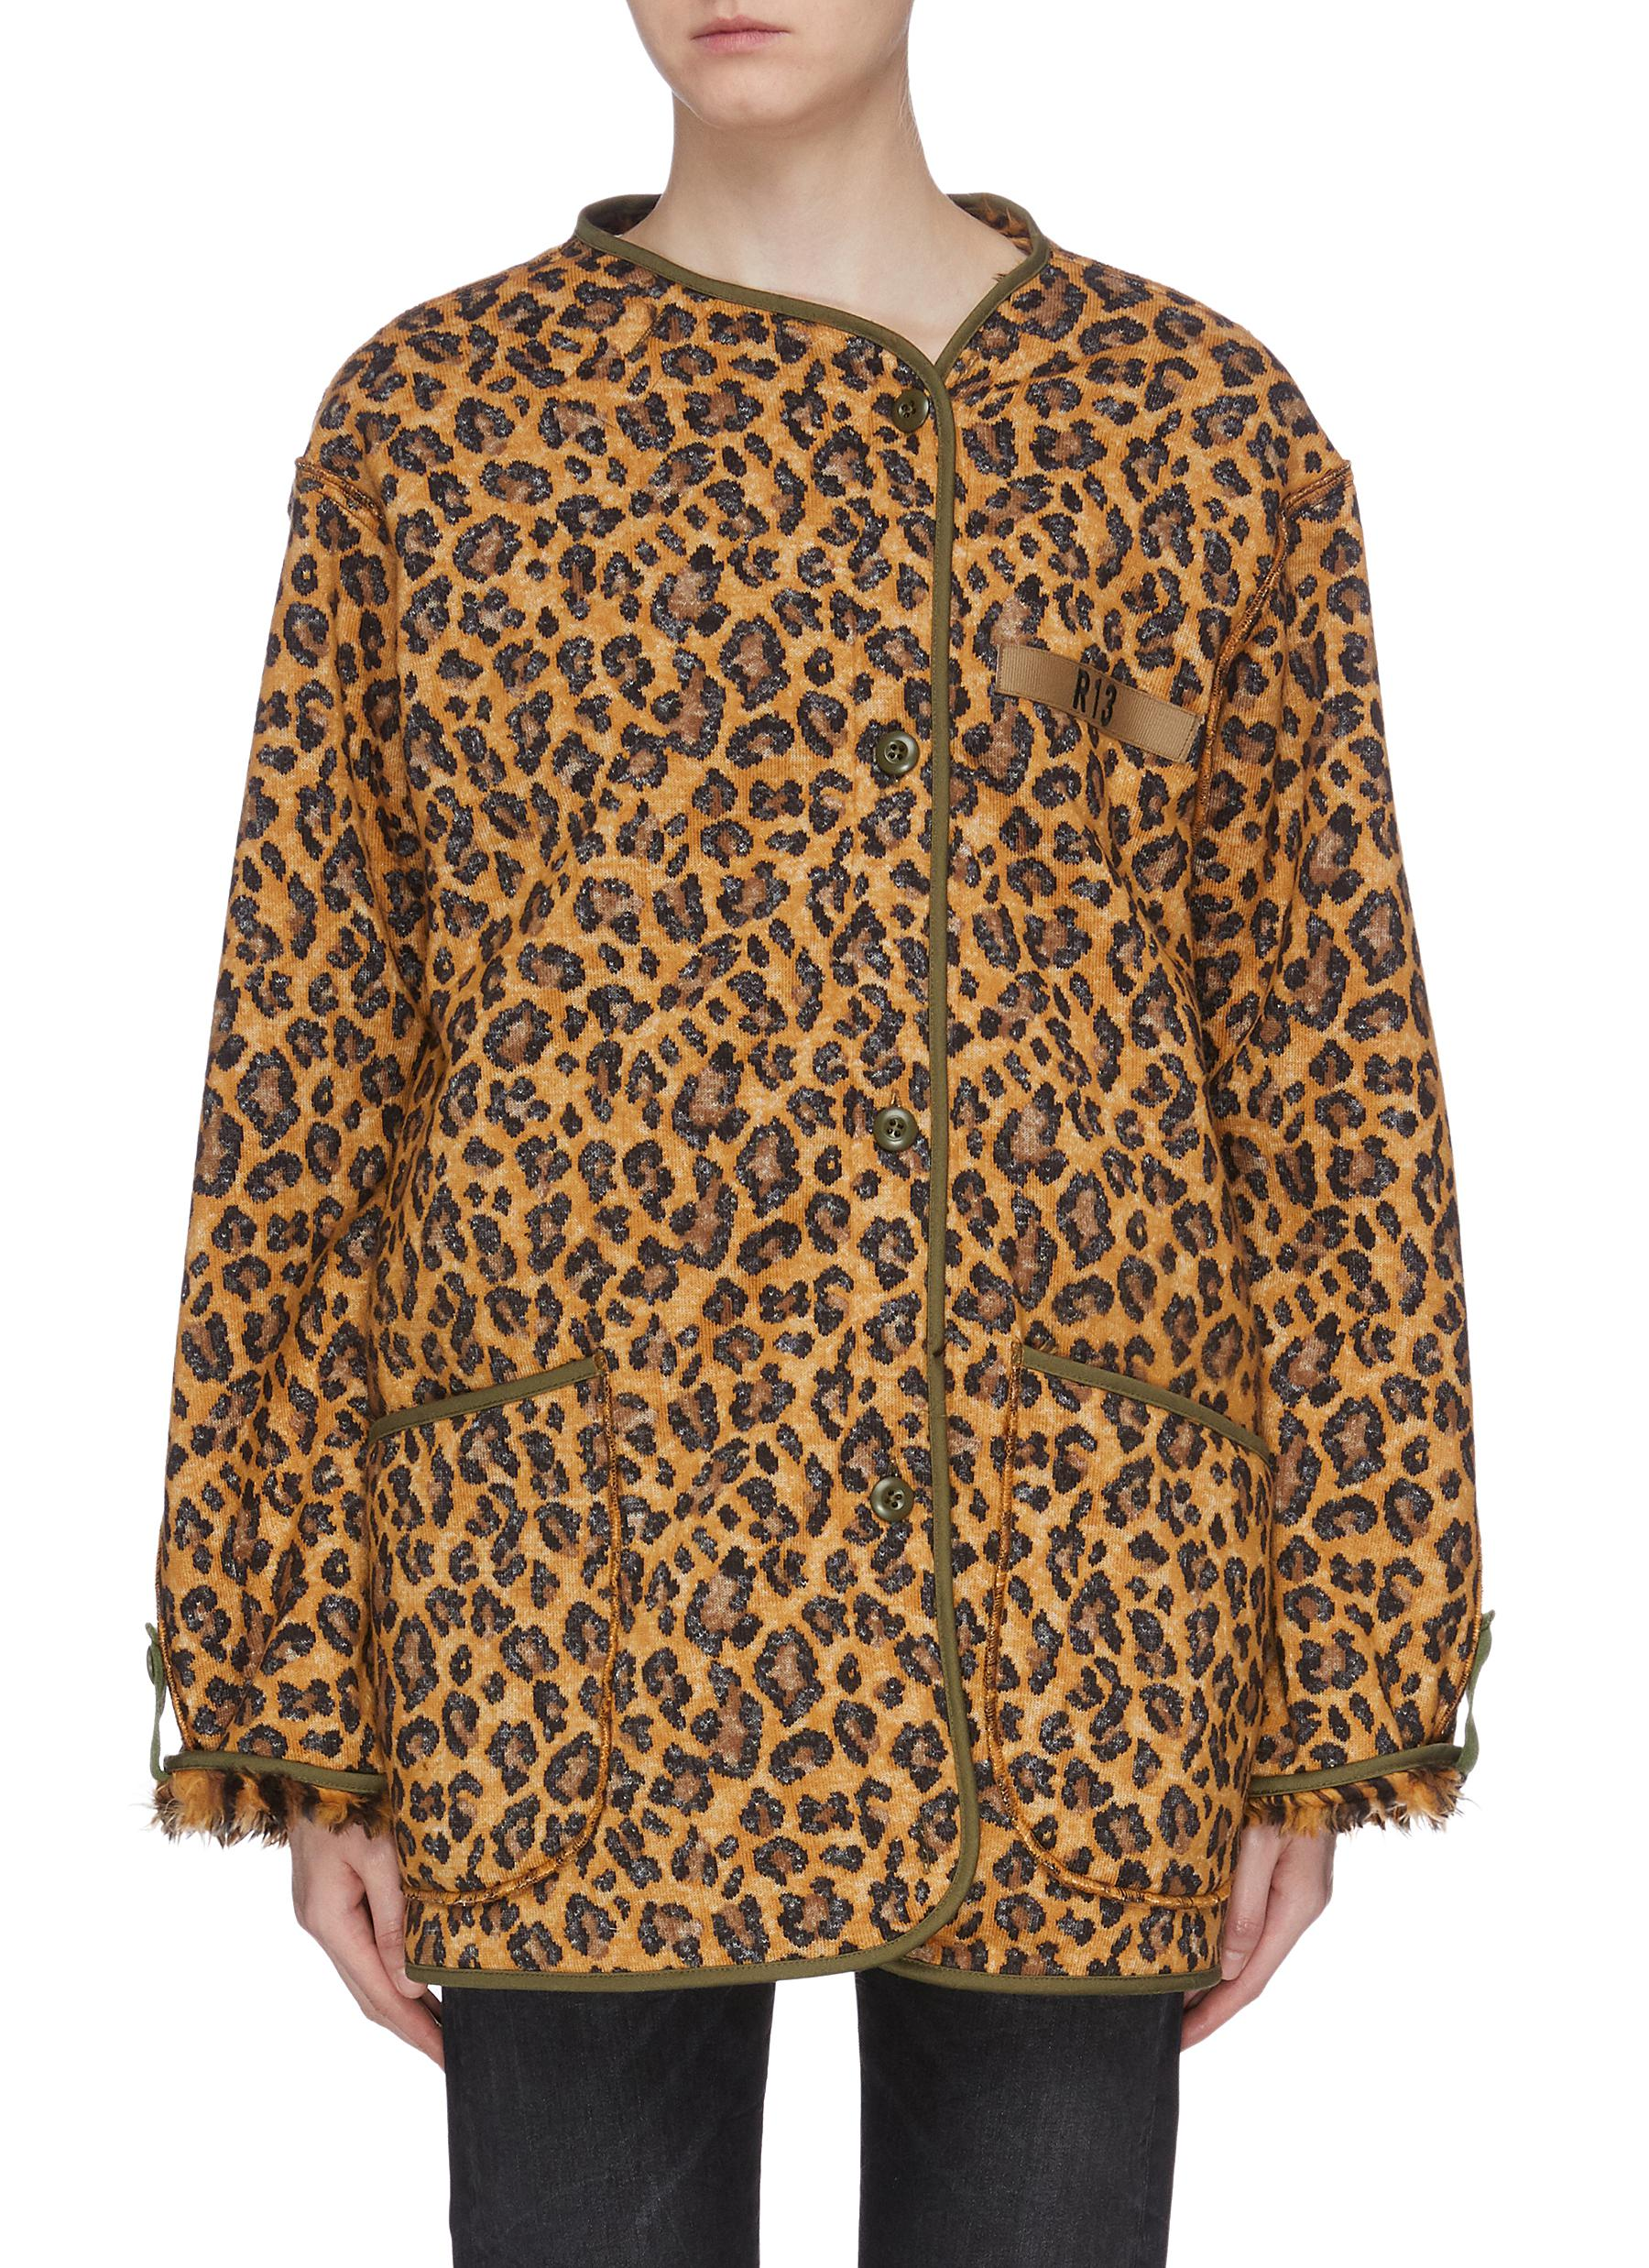 Leopard print oversized jacket by R13